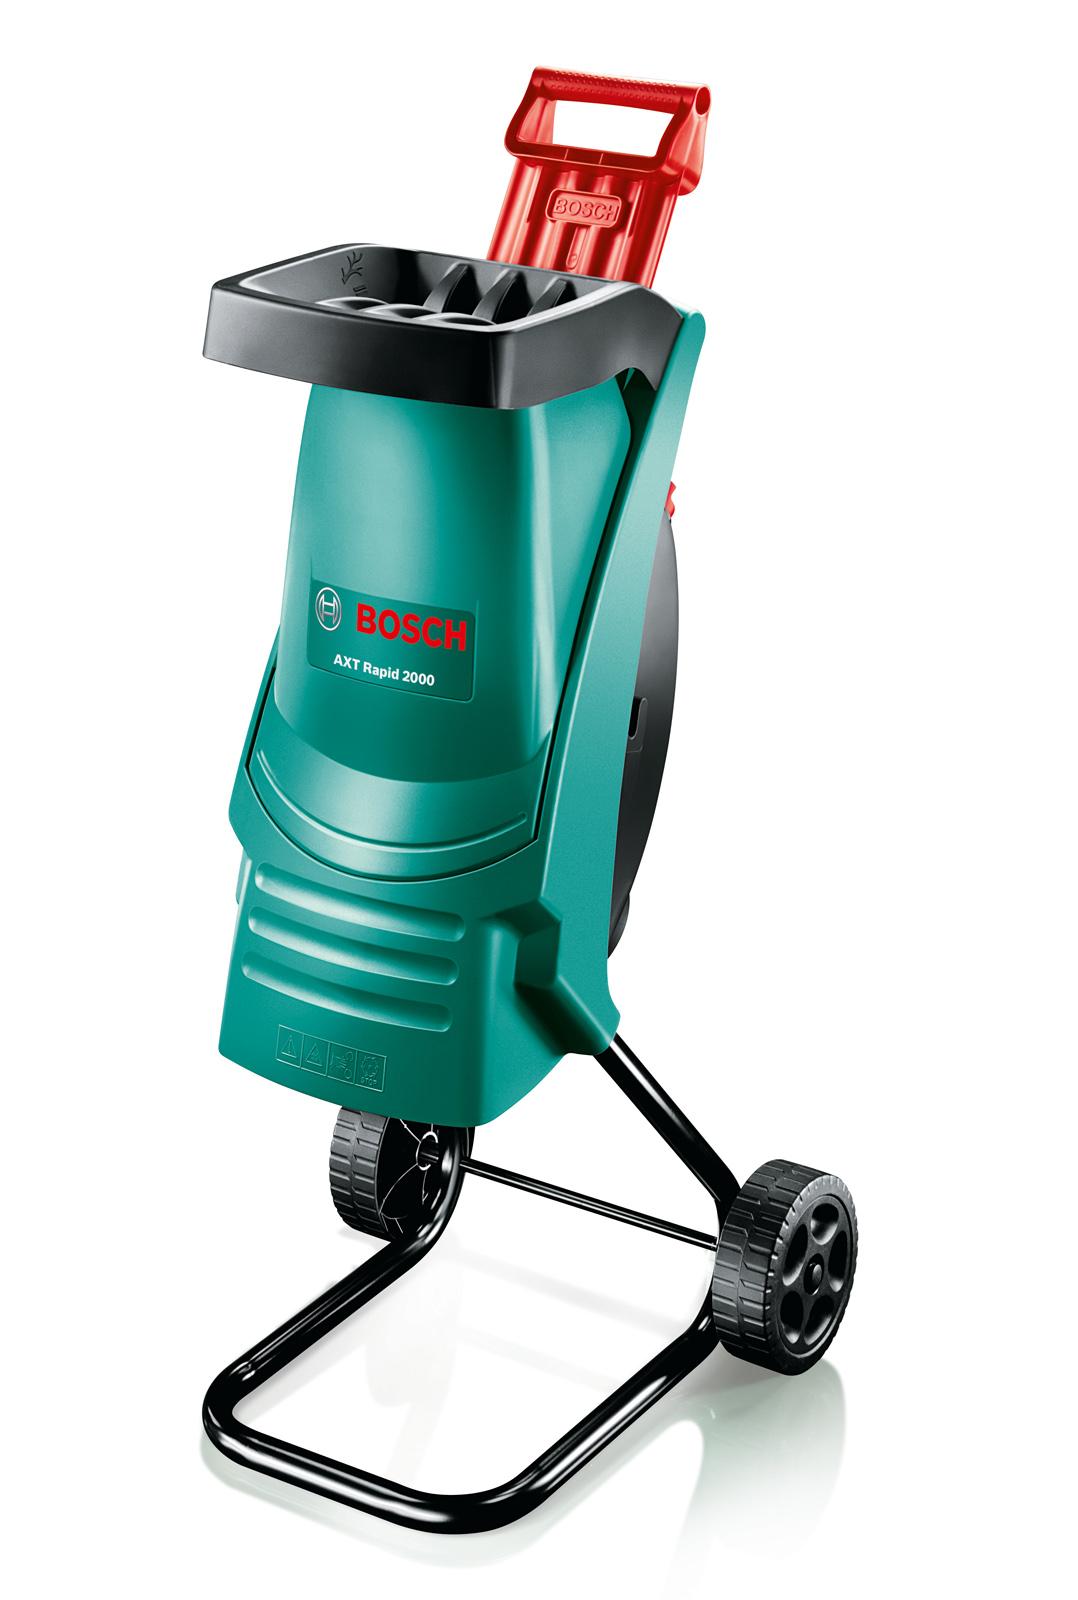 ������� ������������ Bosch Axt rapid 2000